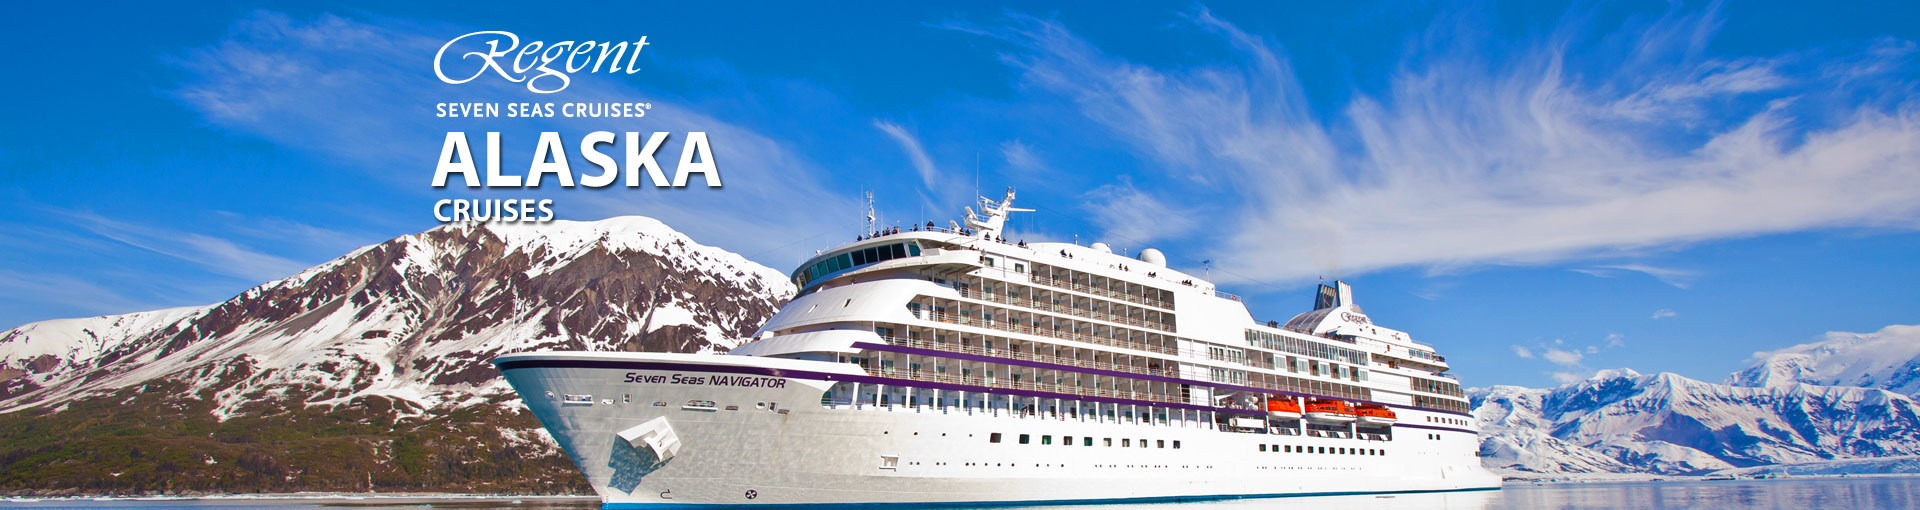 Regent Seven Seas Cruises Alaska Cruises